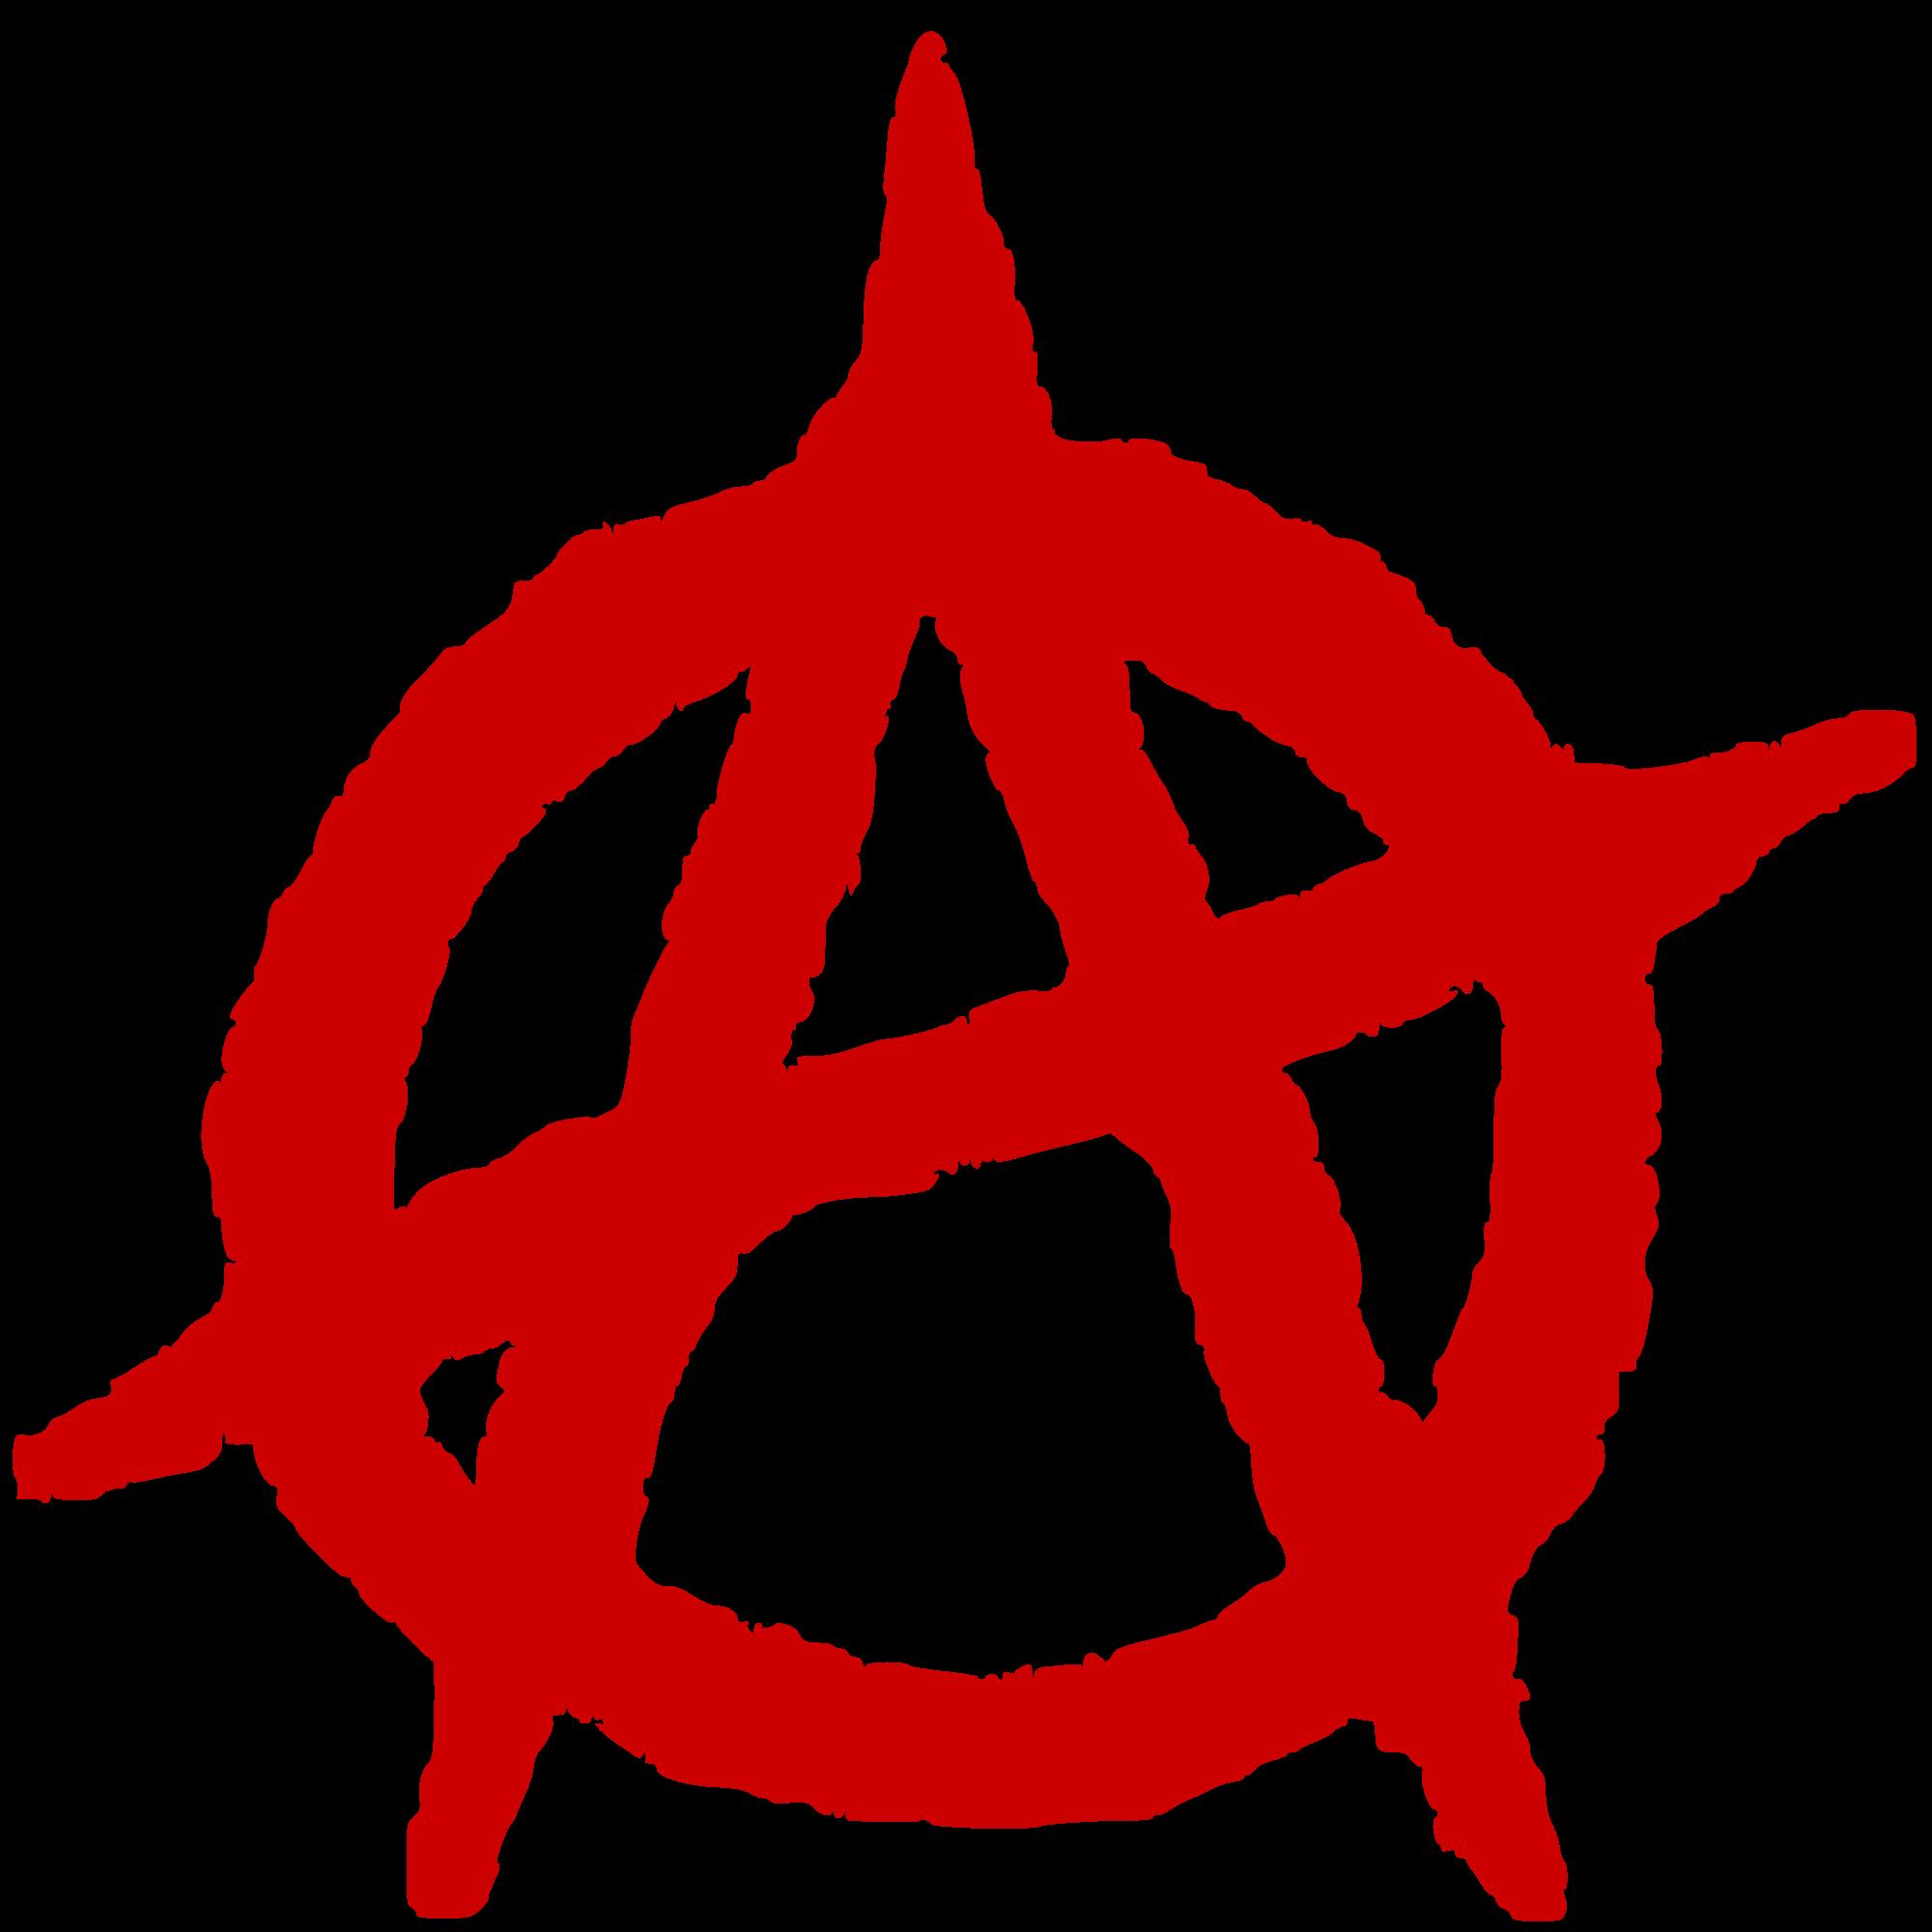 Slikovni rezultat za anarchy